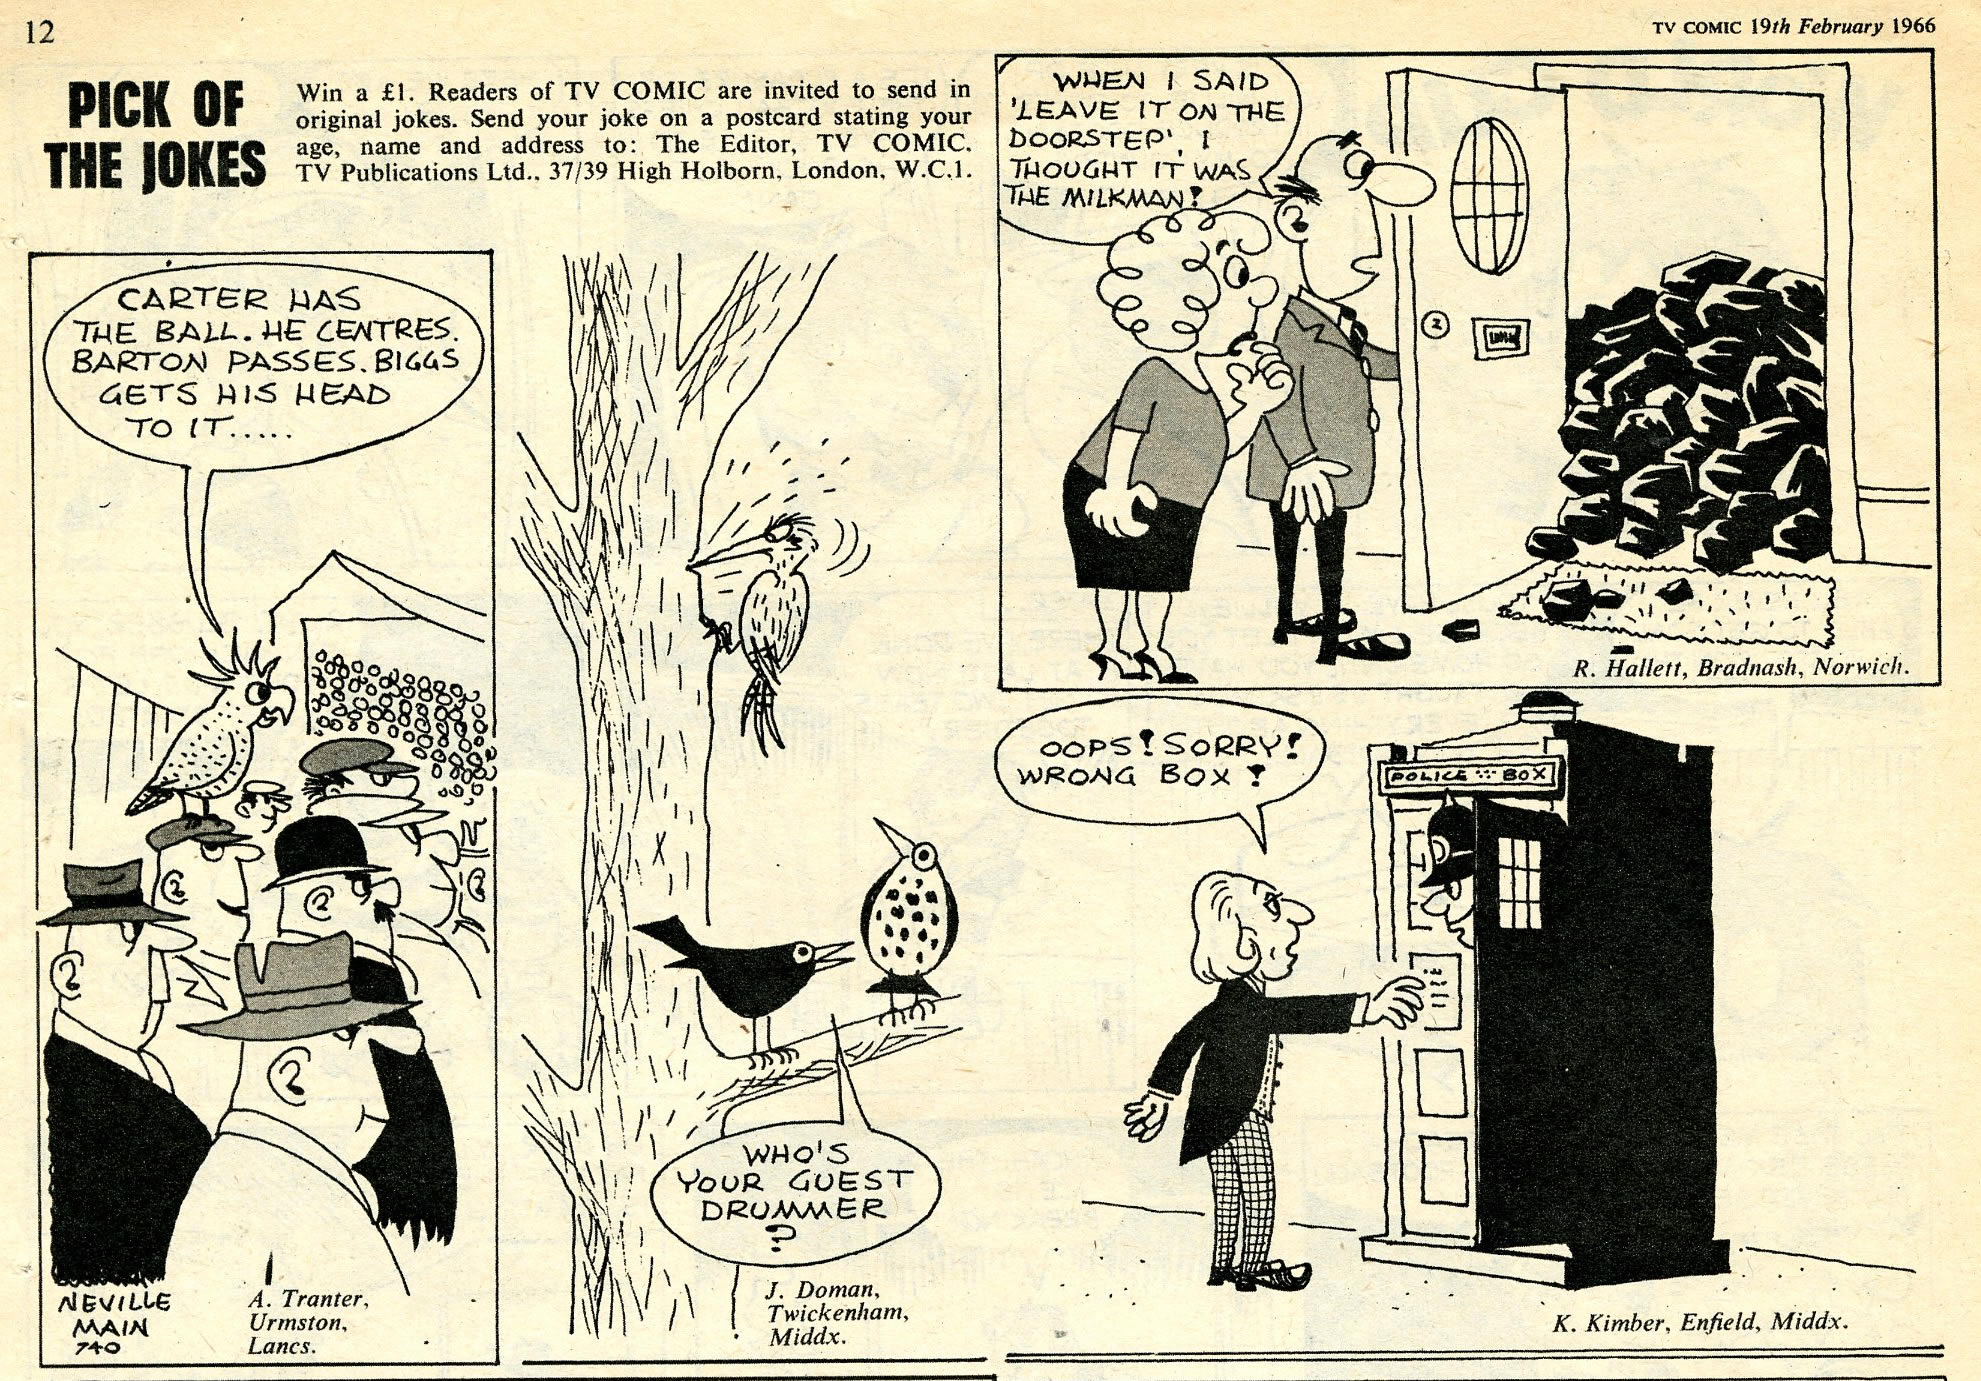 TV Comic, no. 740, 19 February 1966